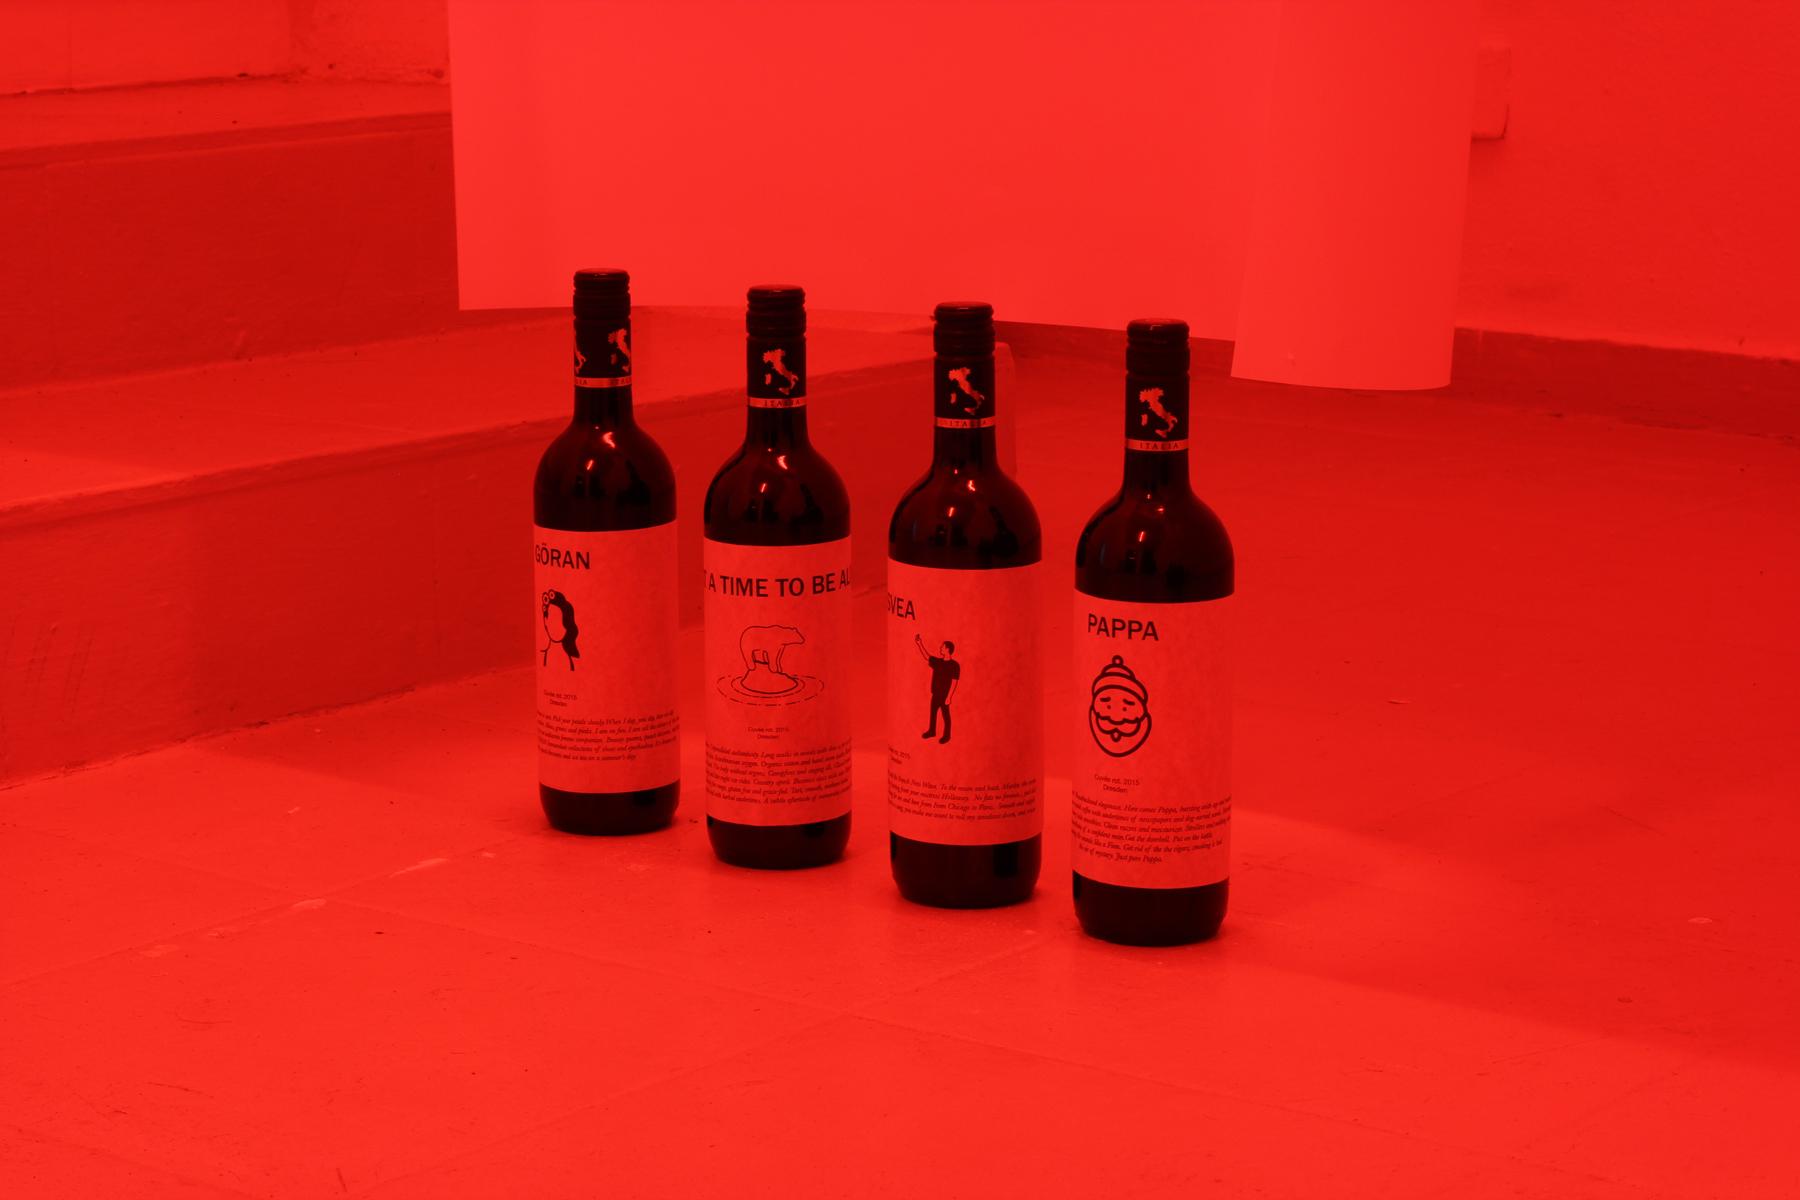 detailview_wine